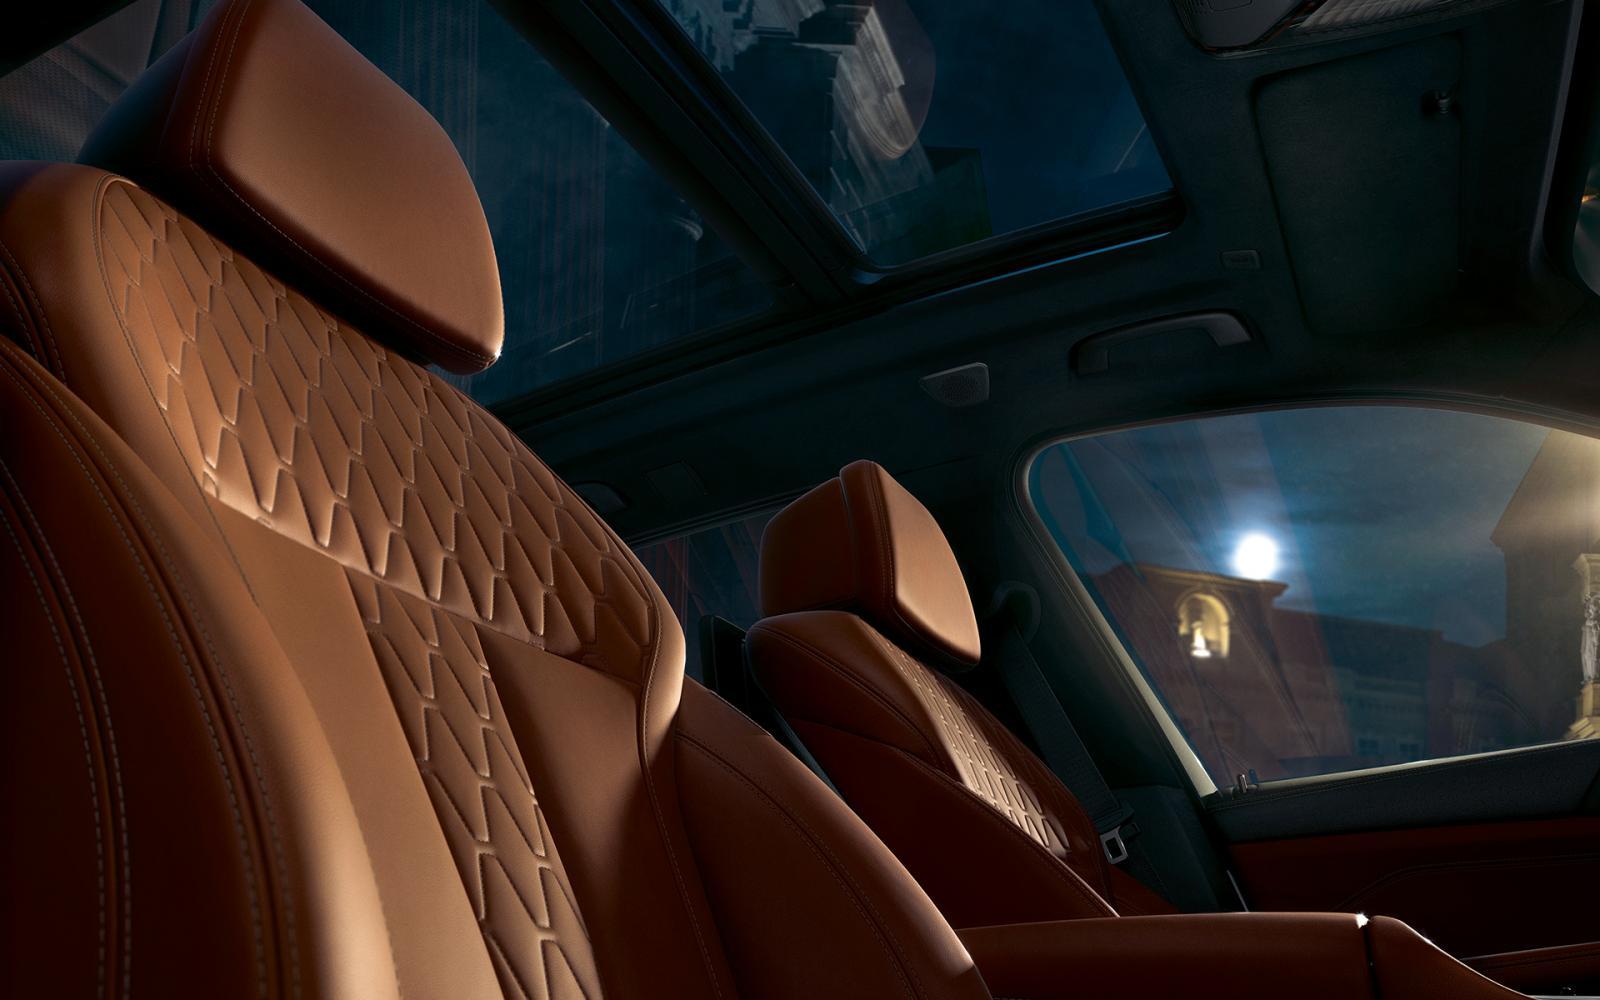 BMW X5 2020 precio en México